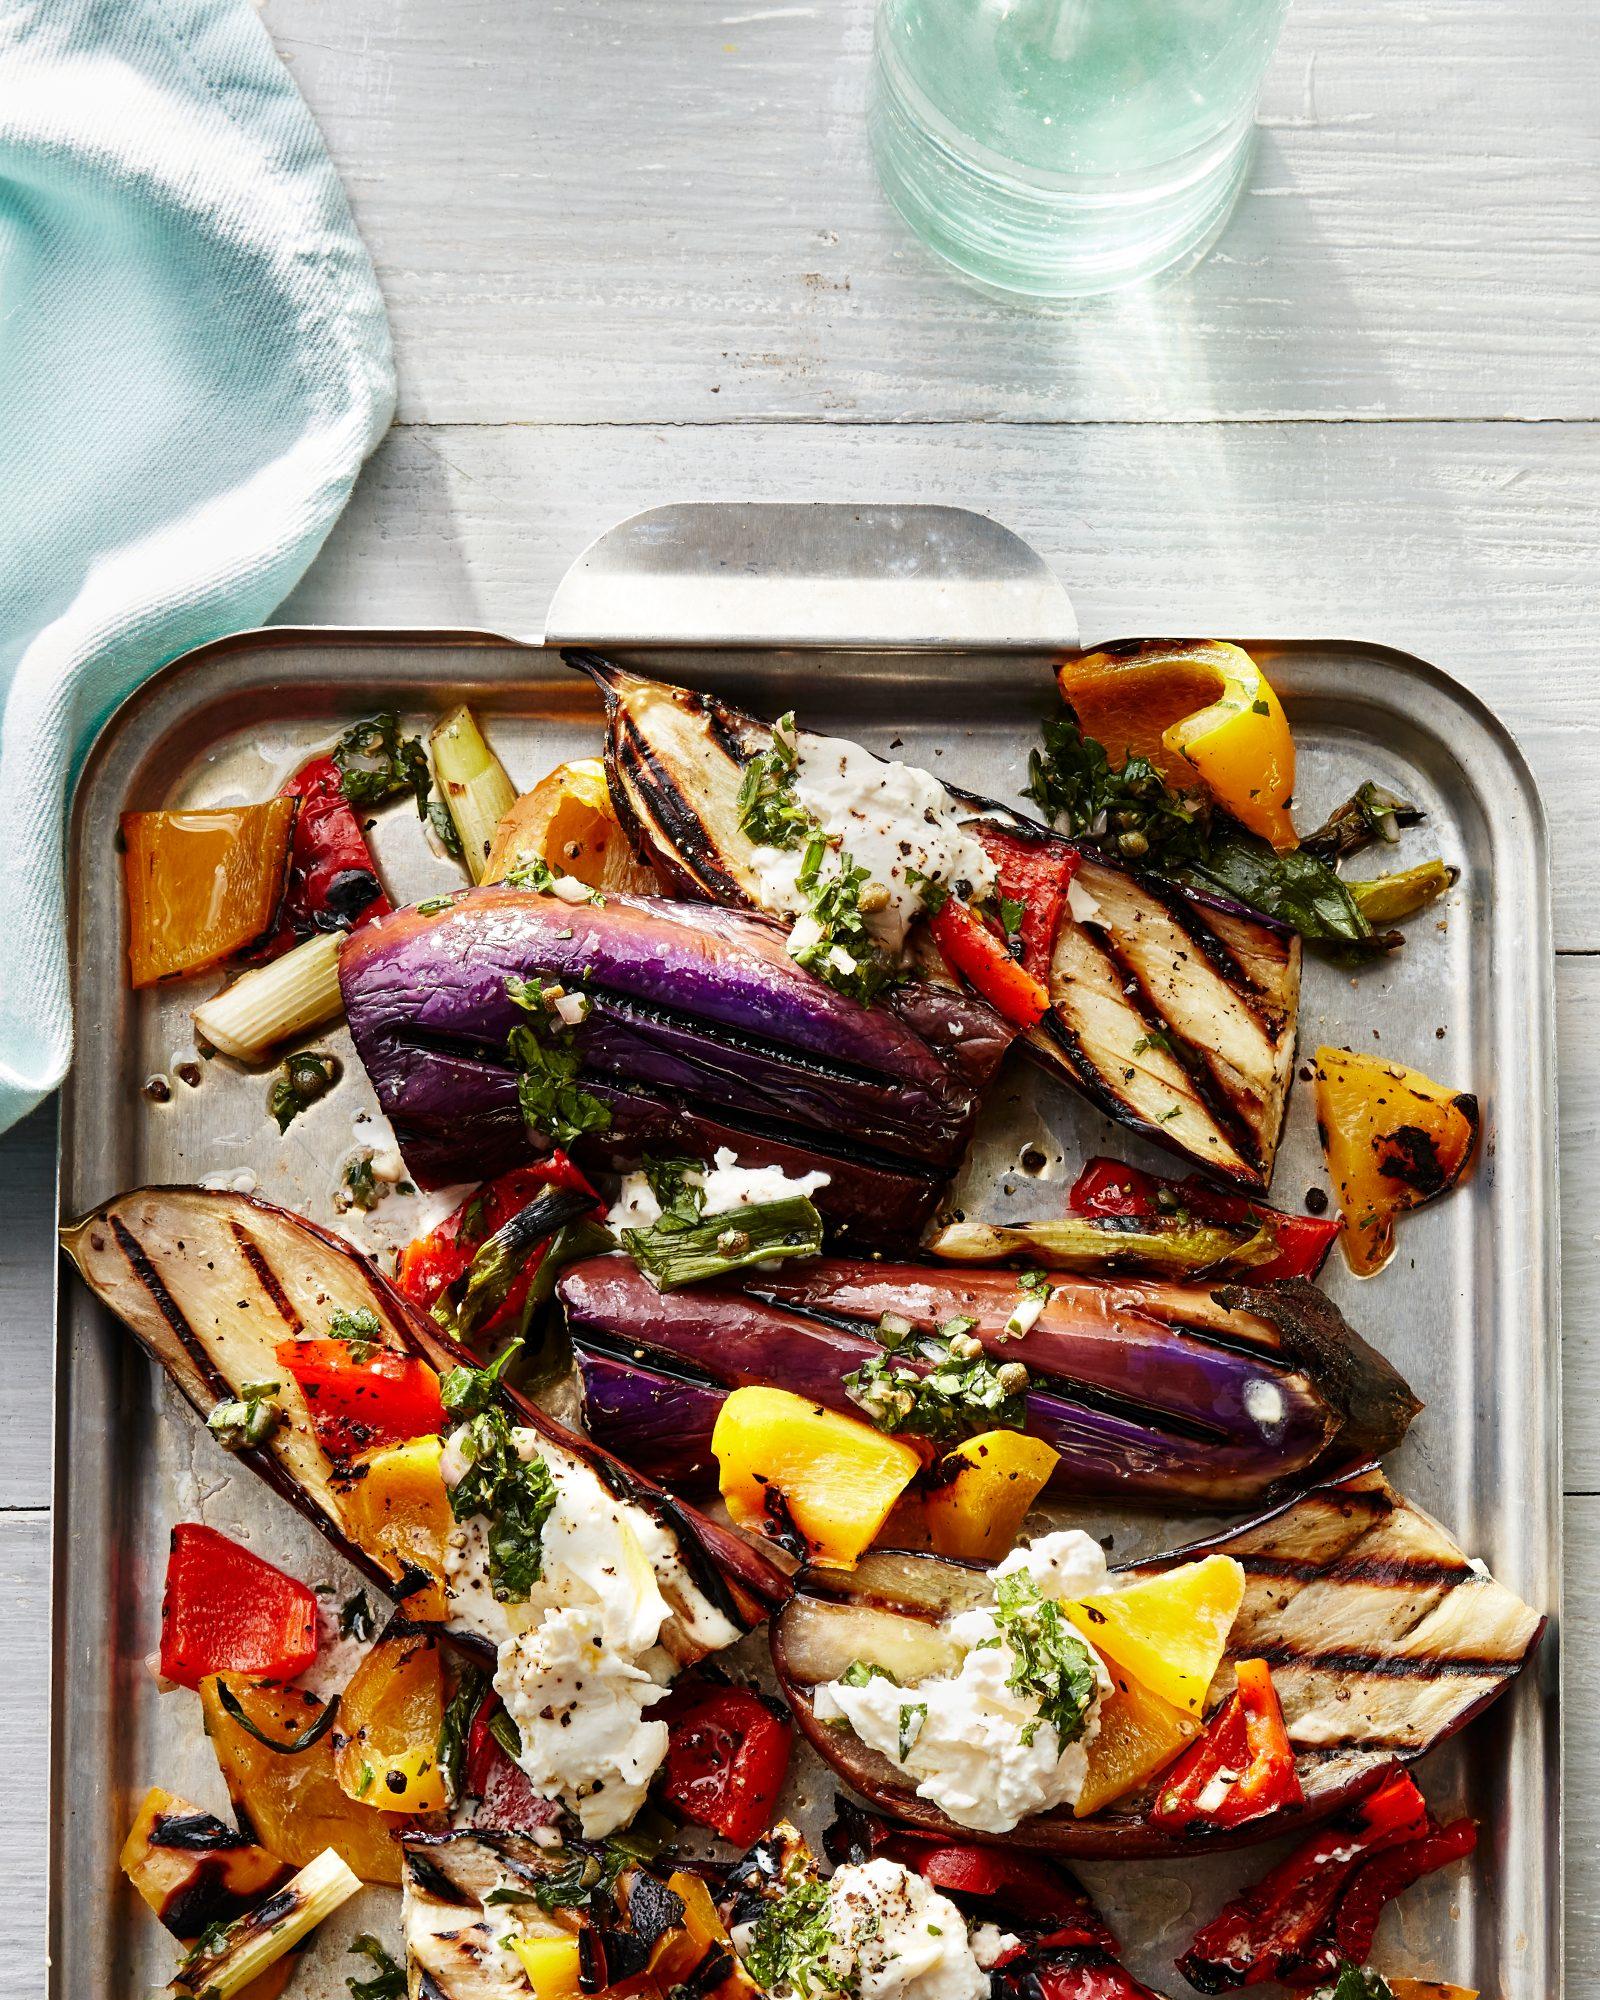 Charred Eggplant with Salsa Verde and Burrata